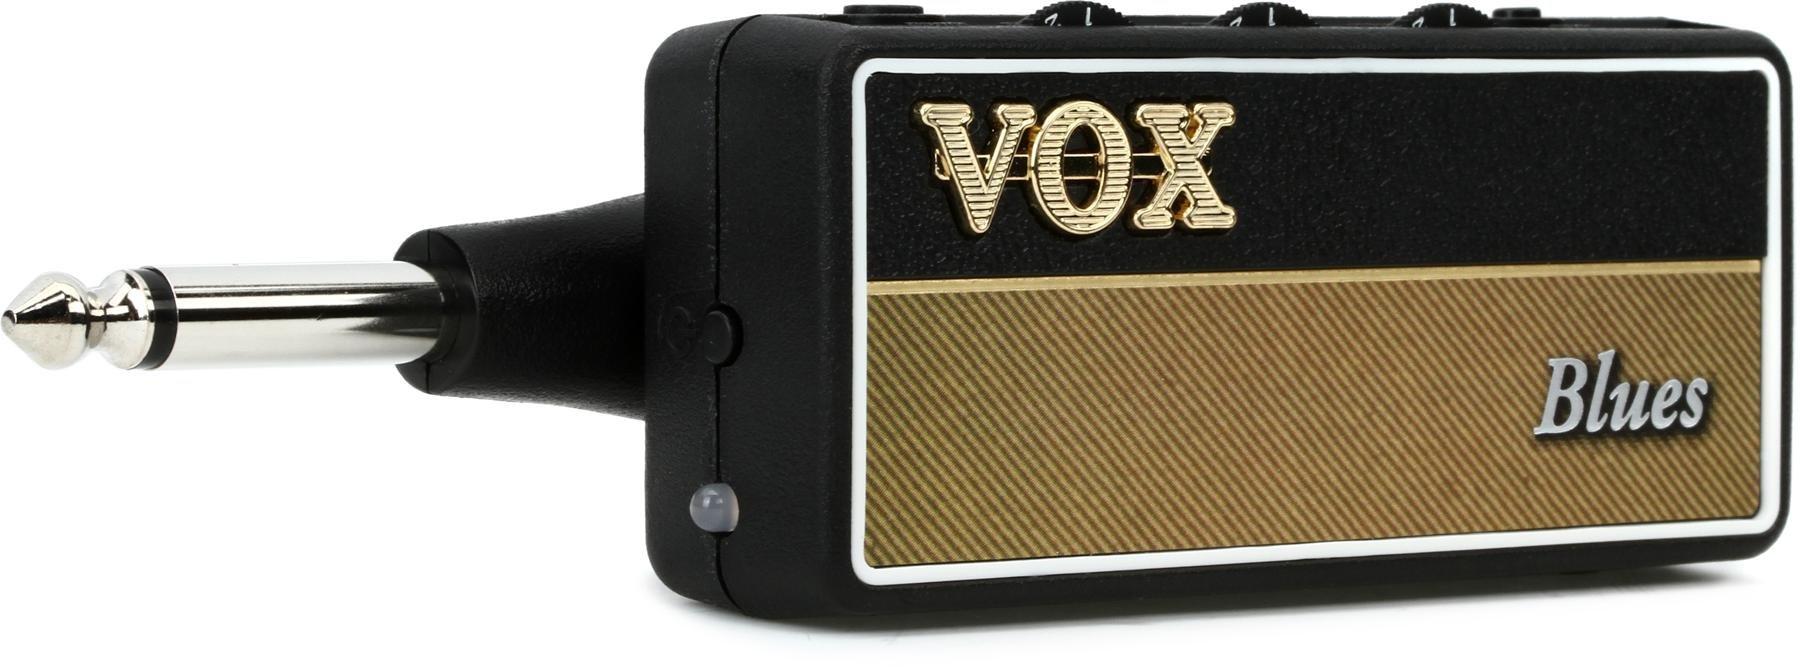 Vox Amplug 2 Ac30 Headphone Guitar Amp Sweetwater Input Jack Wiring Blues